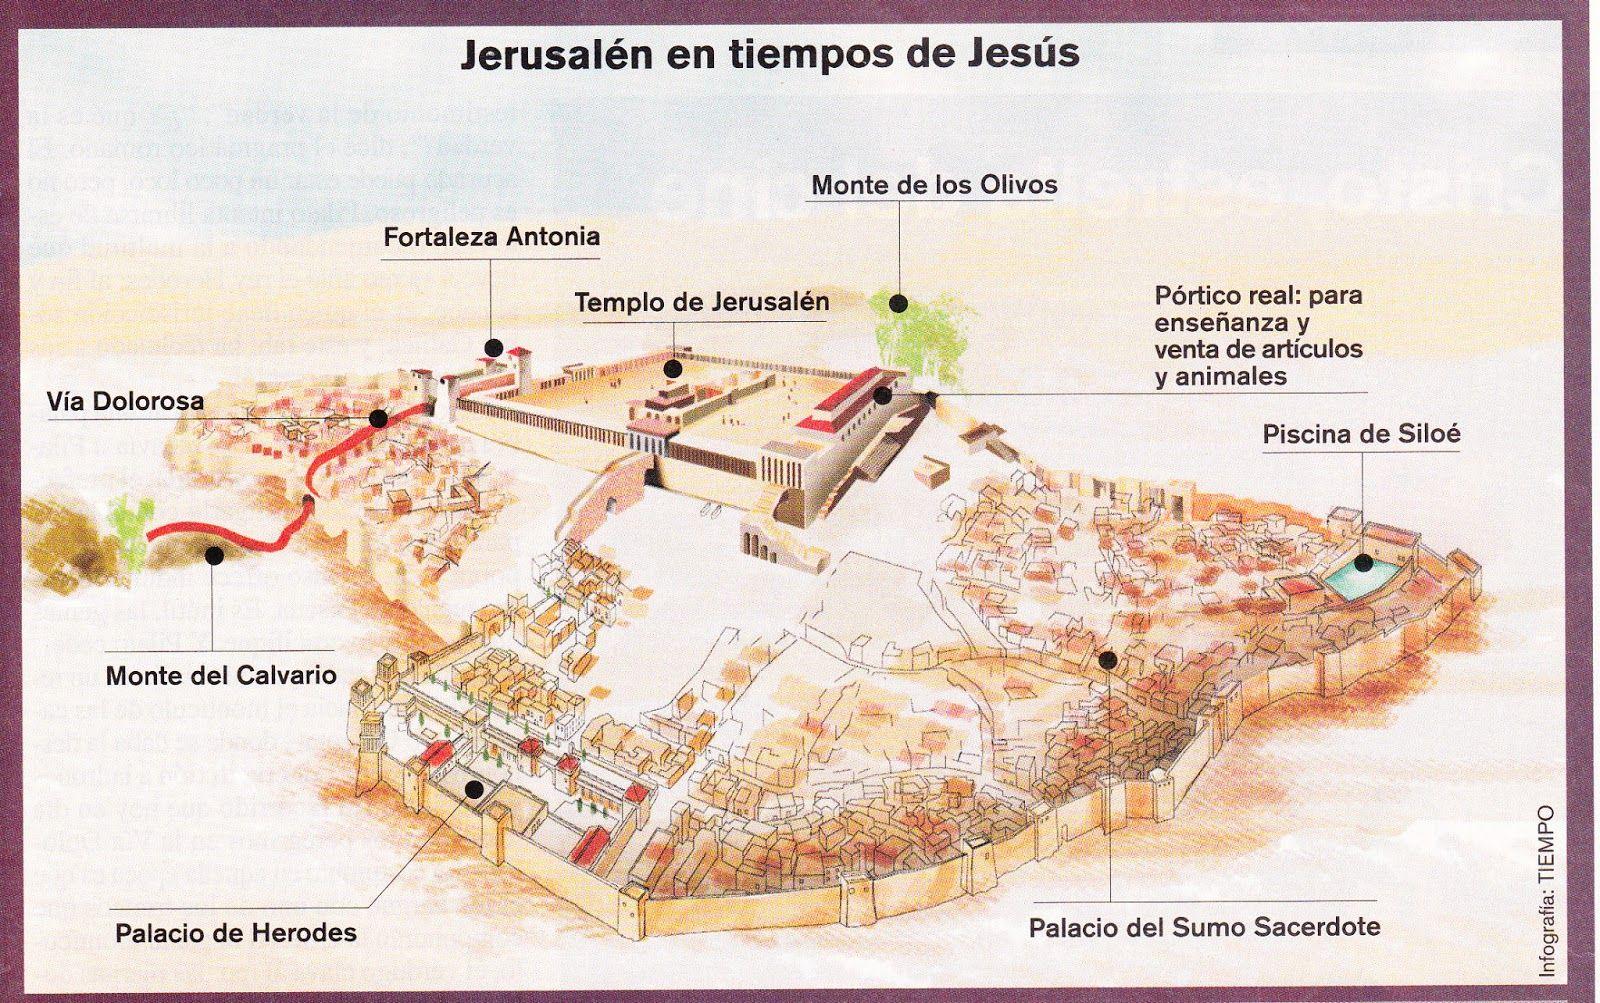 Img 0001 New Jpg 1600 1003 De Jesus Tema Jesús